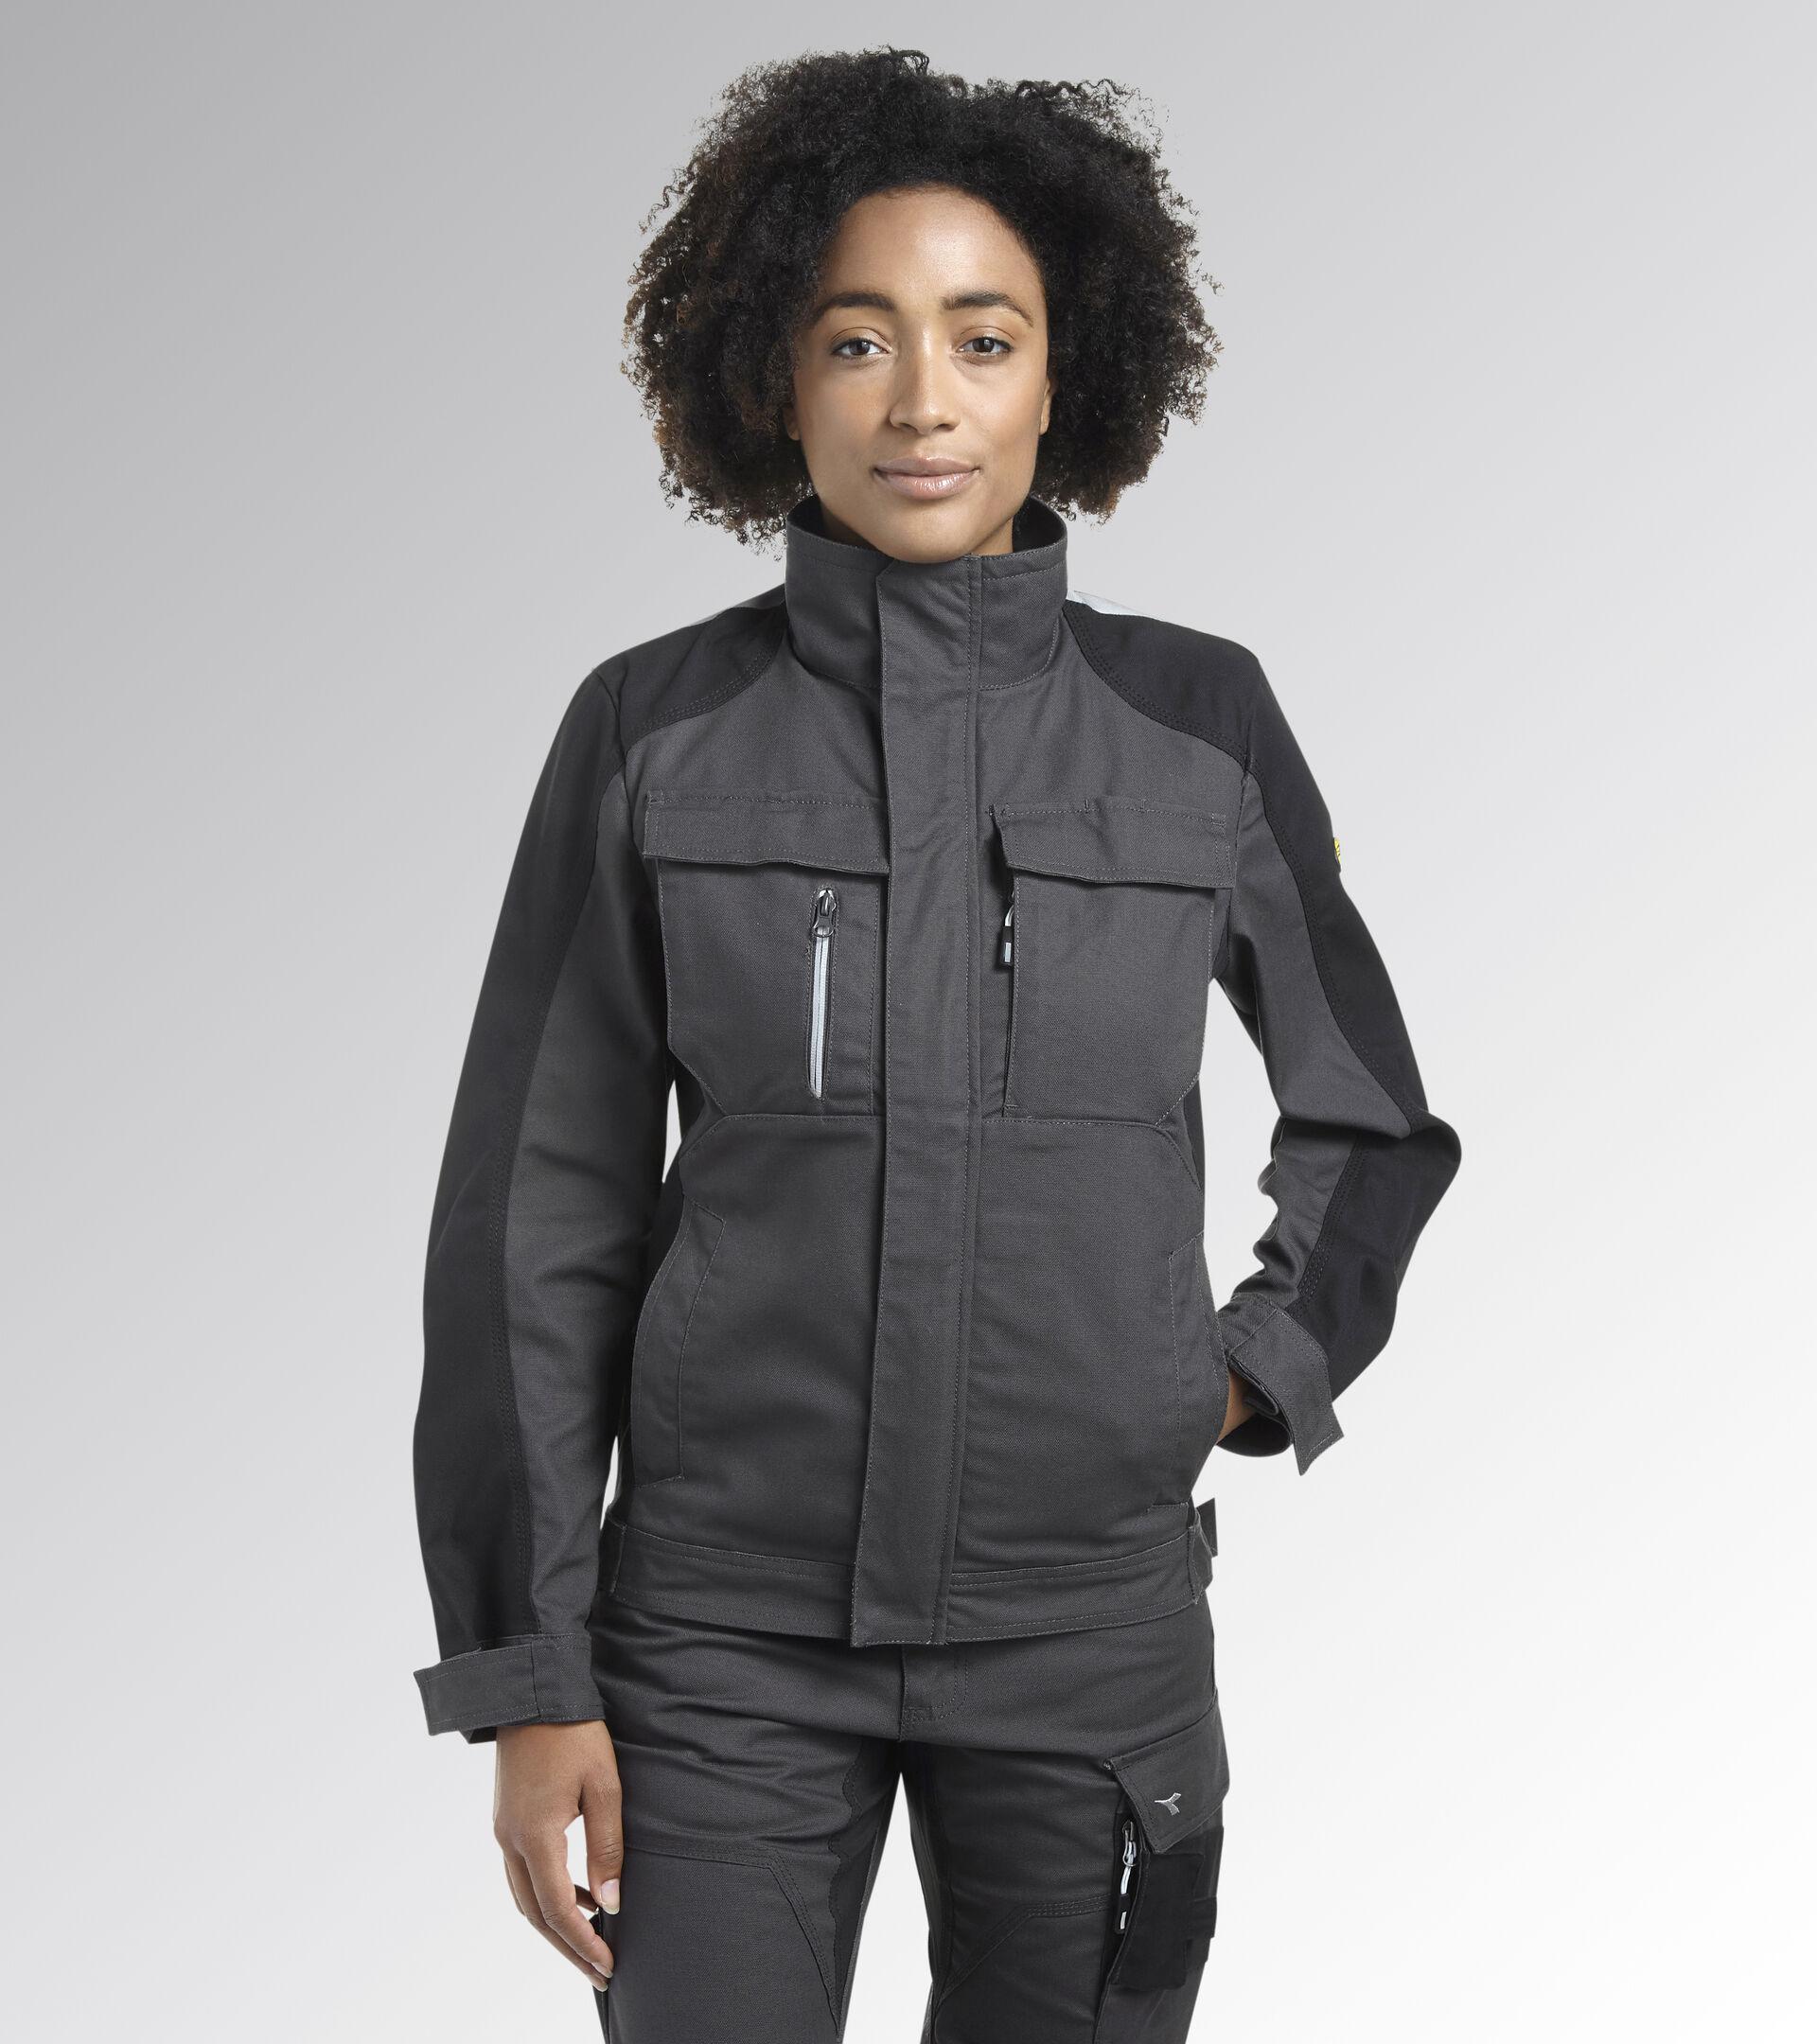 Apparel Utility UOMO WORKWEAR JKT TECH BLACK COAL Utility